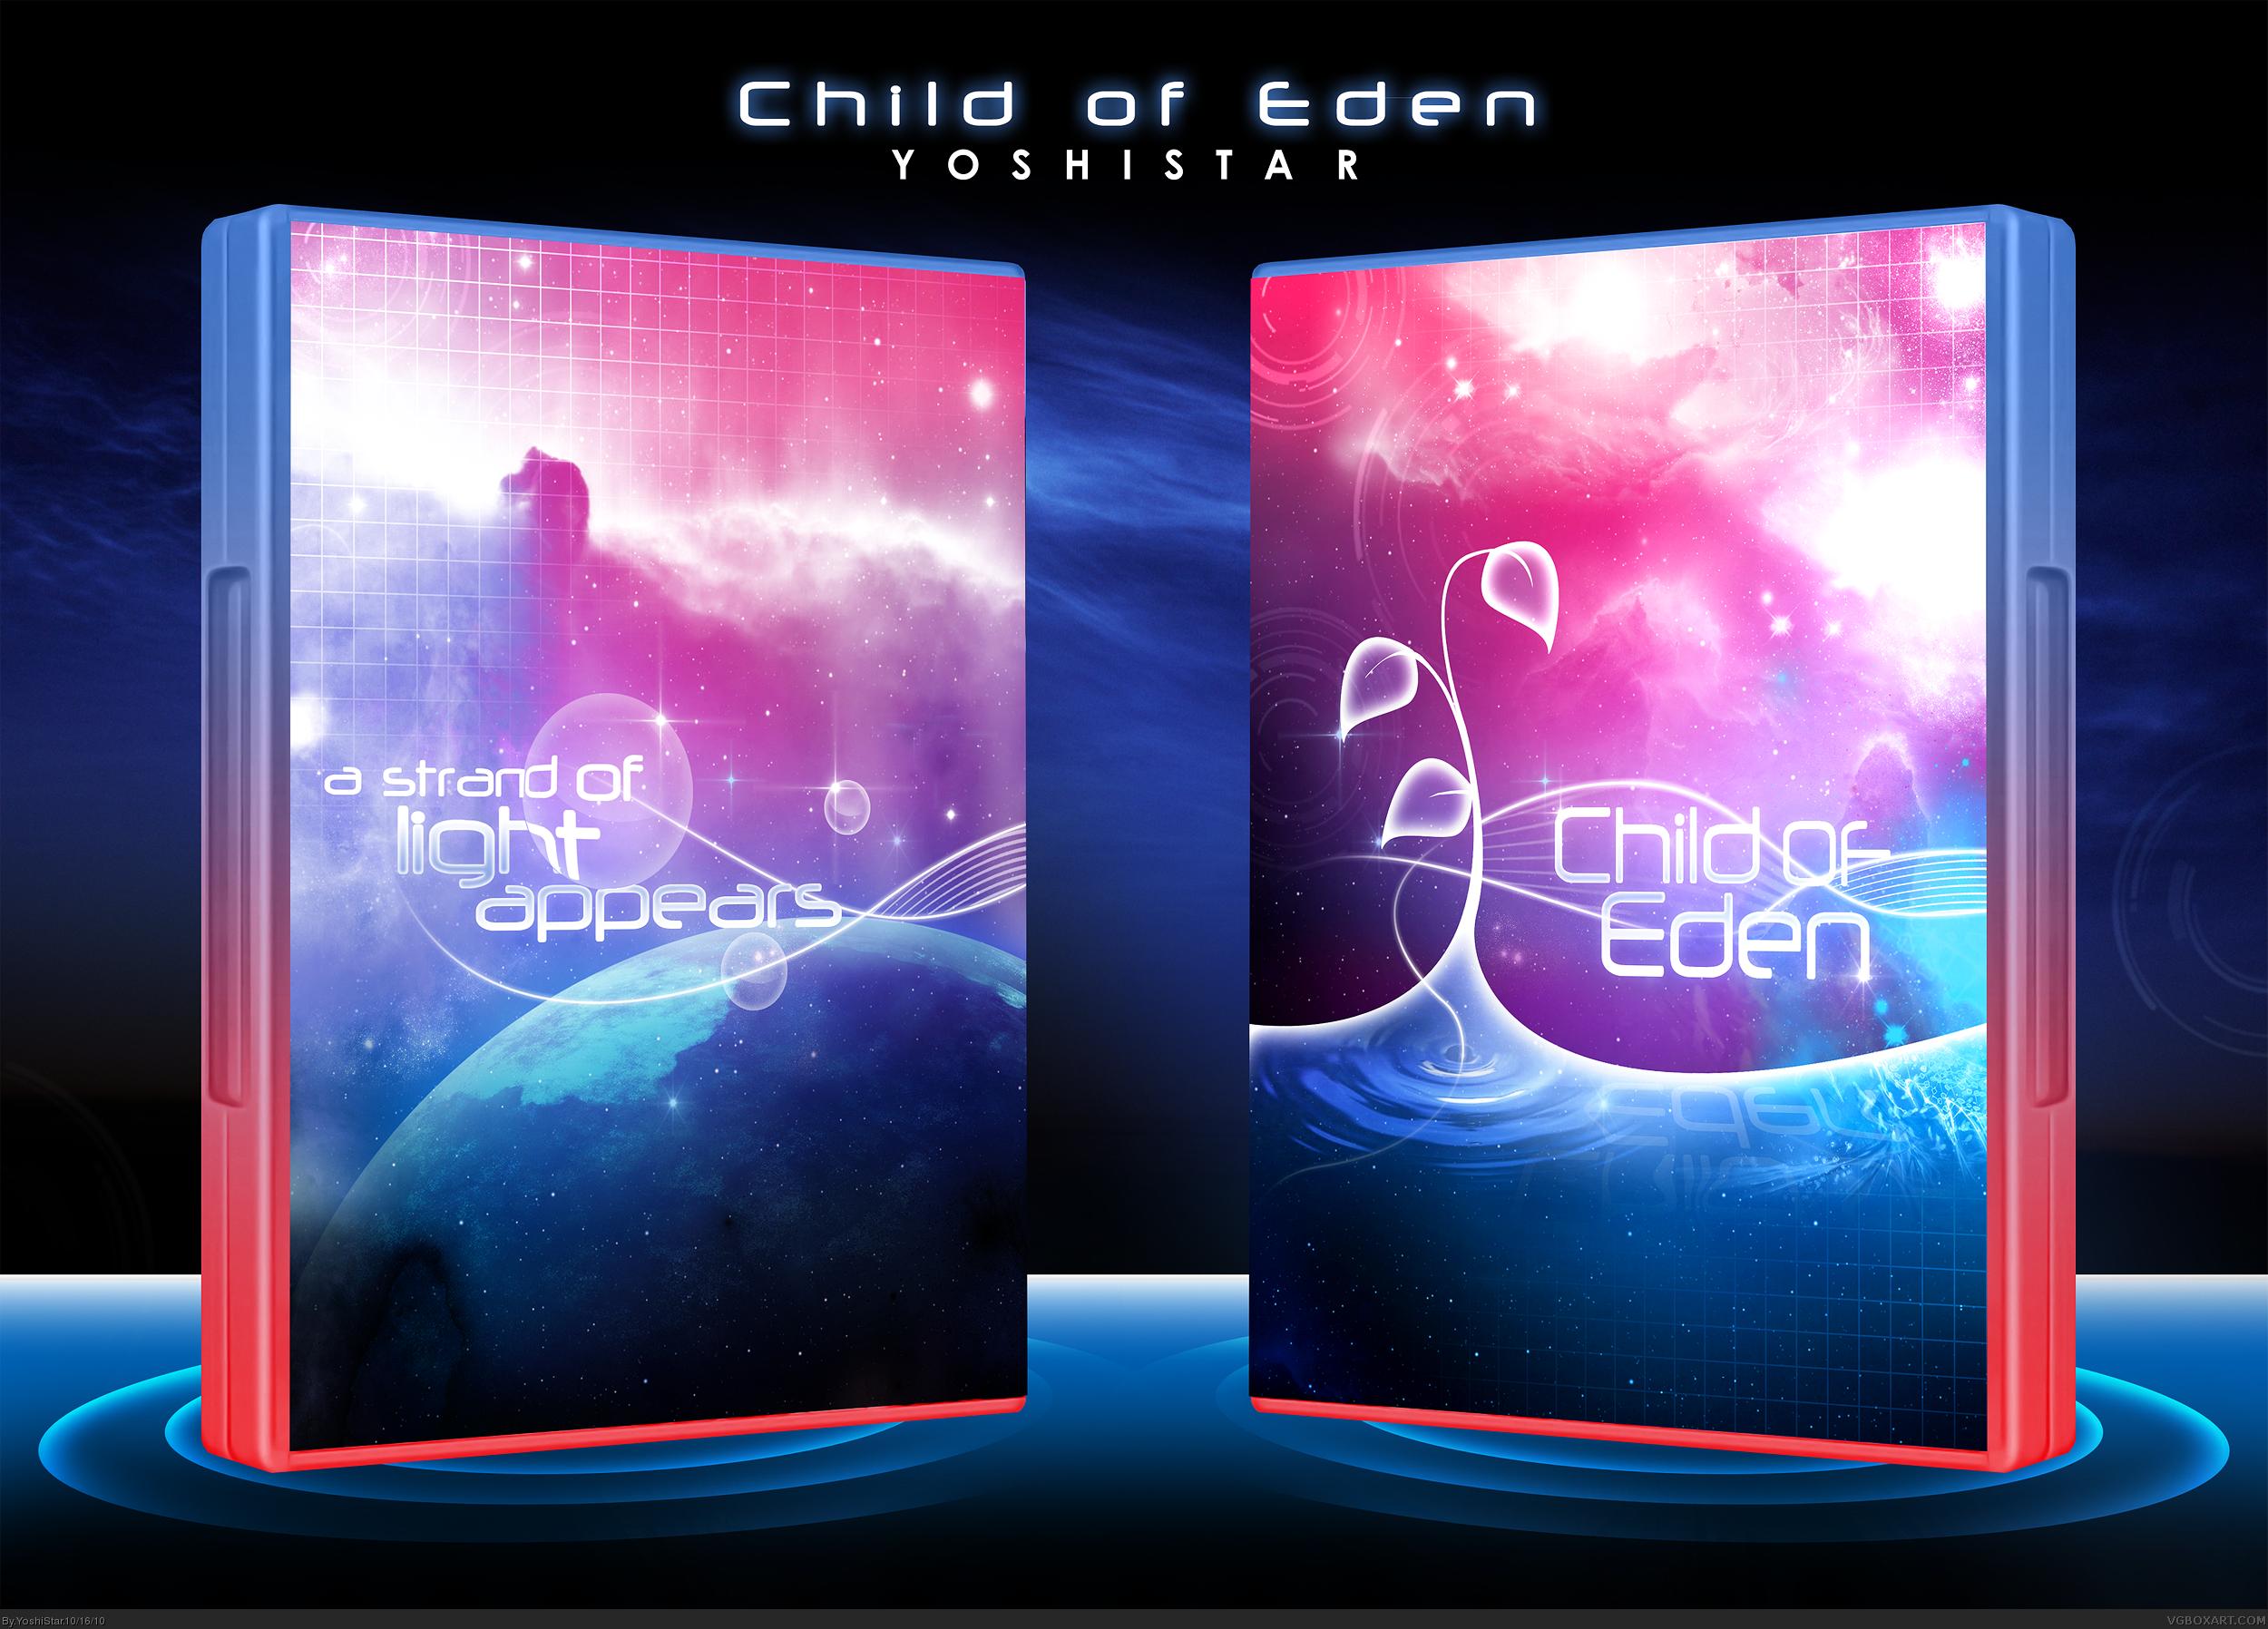 Children Of Eden Book Cover ~ Child of eden xbox box art cover by yoshistar